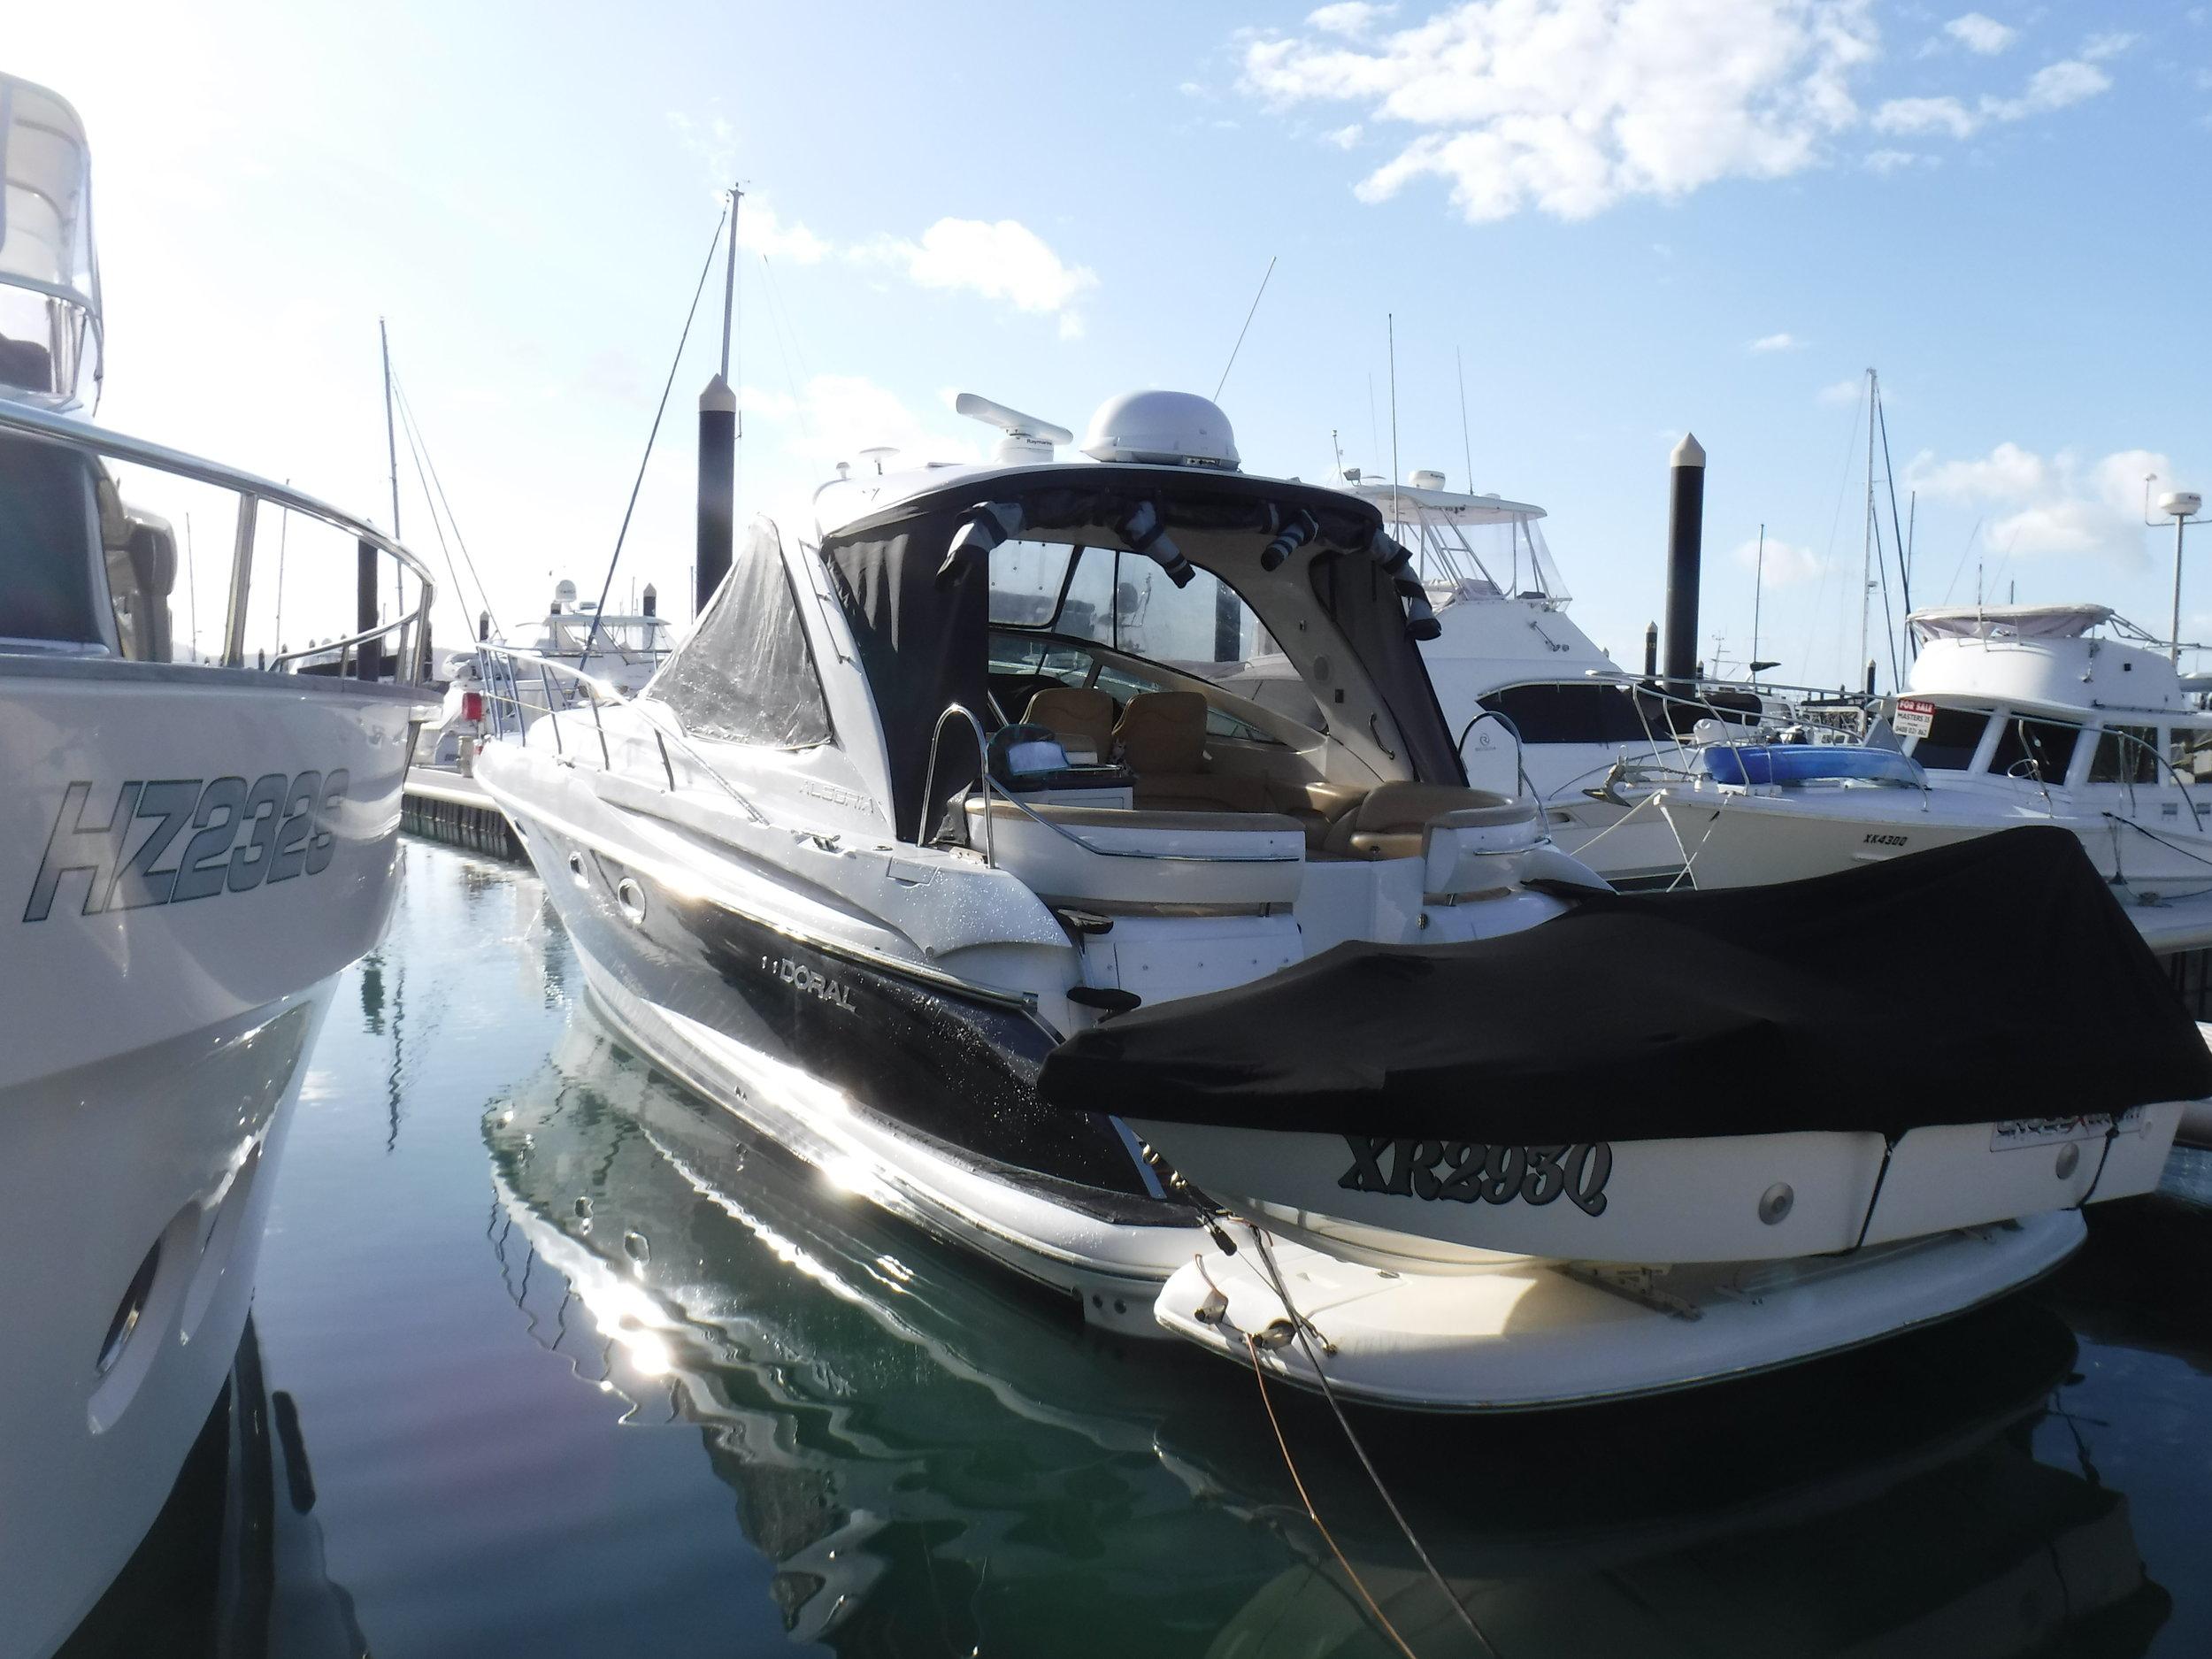 bonefish and new boats 356.JPG